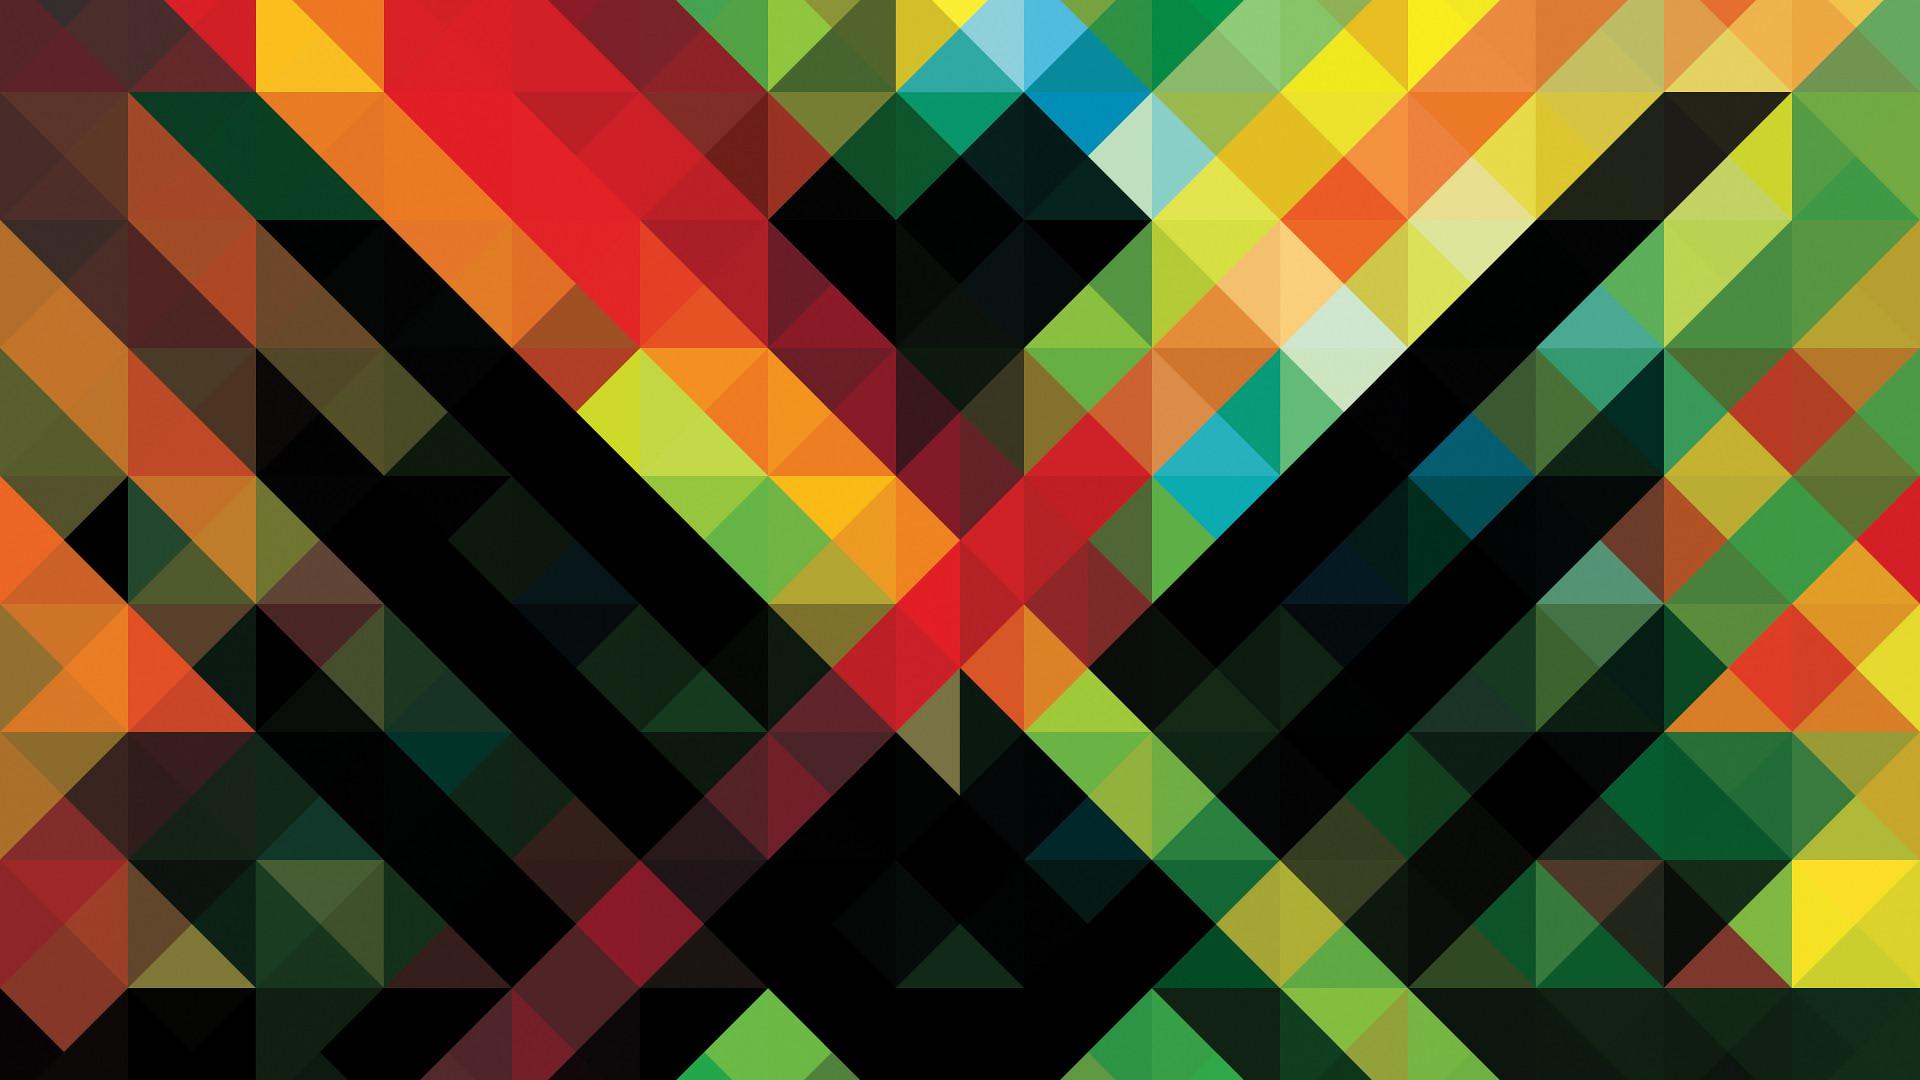 Colorful-HD-Cool-bzfyv-wallpaper-wp3803912